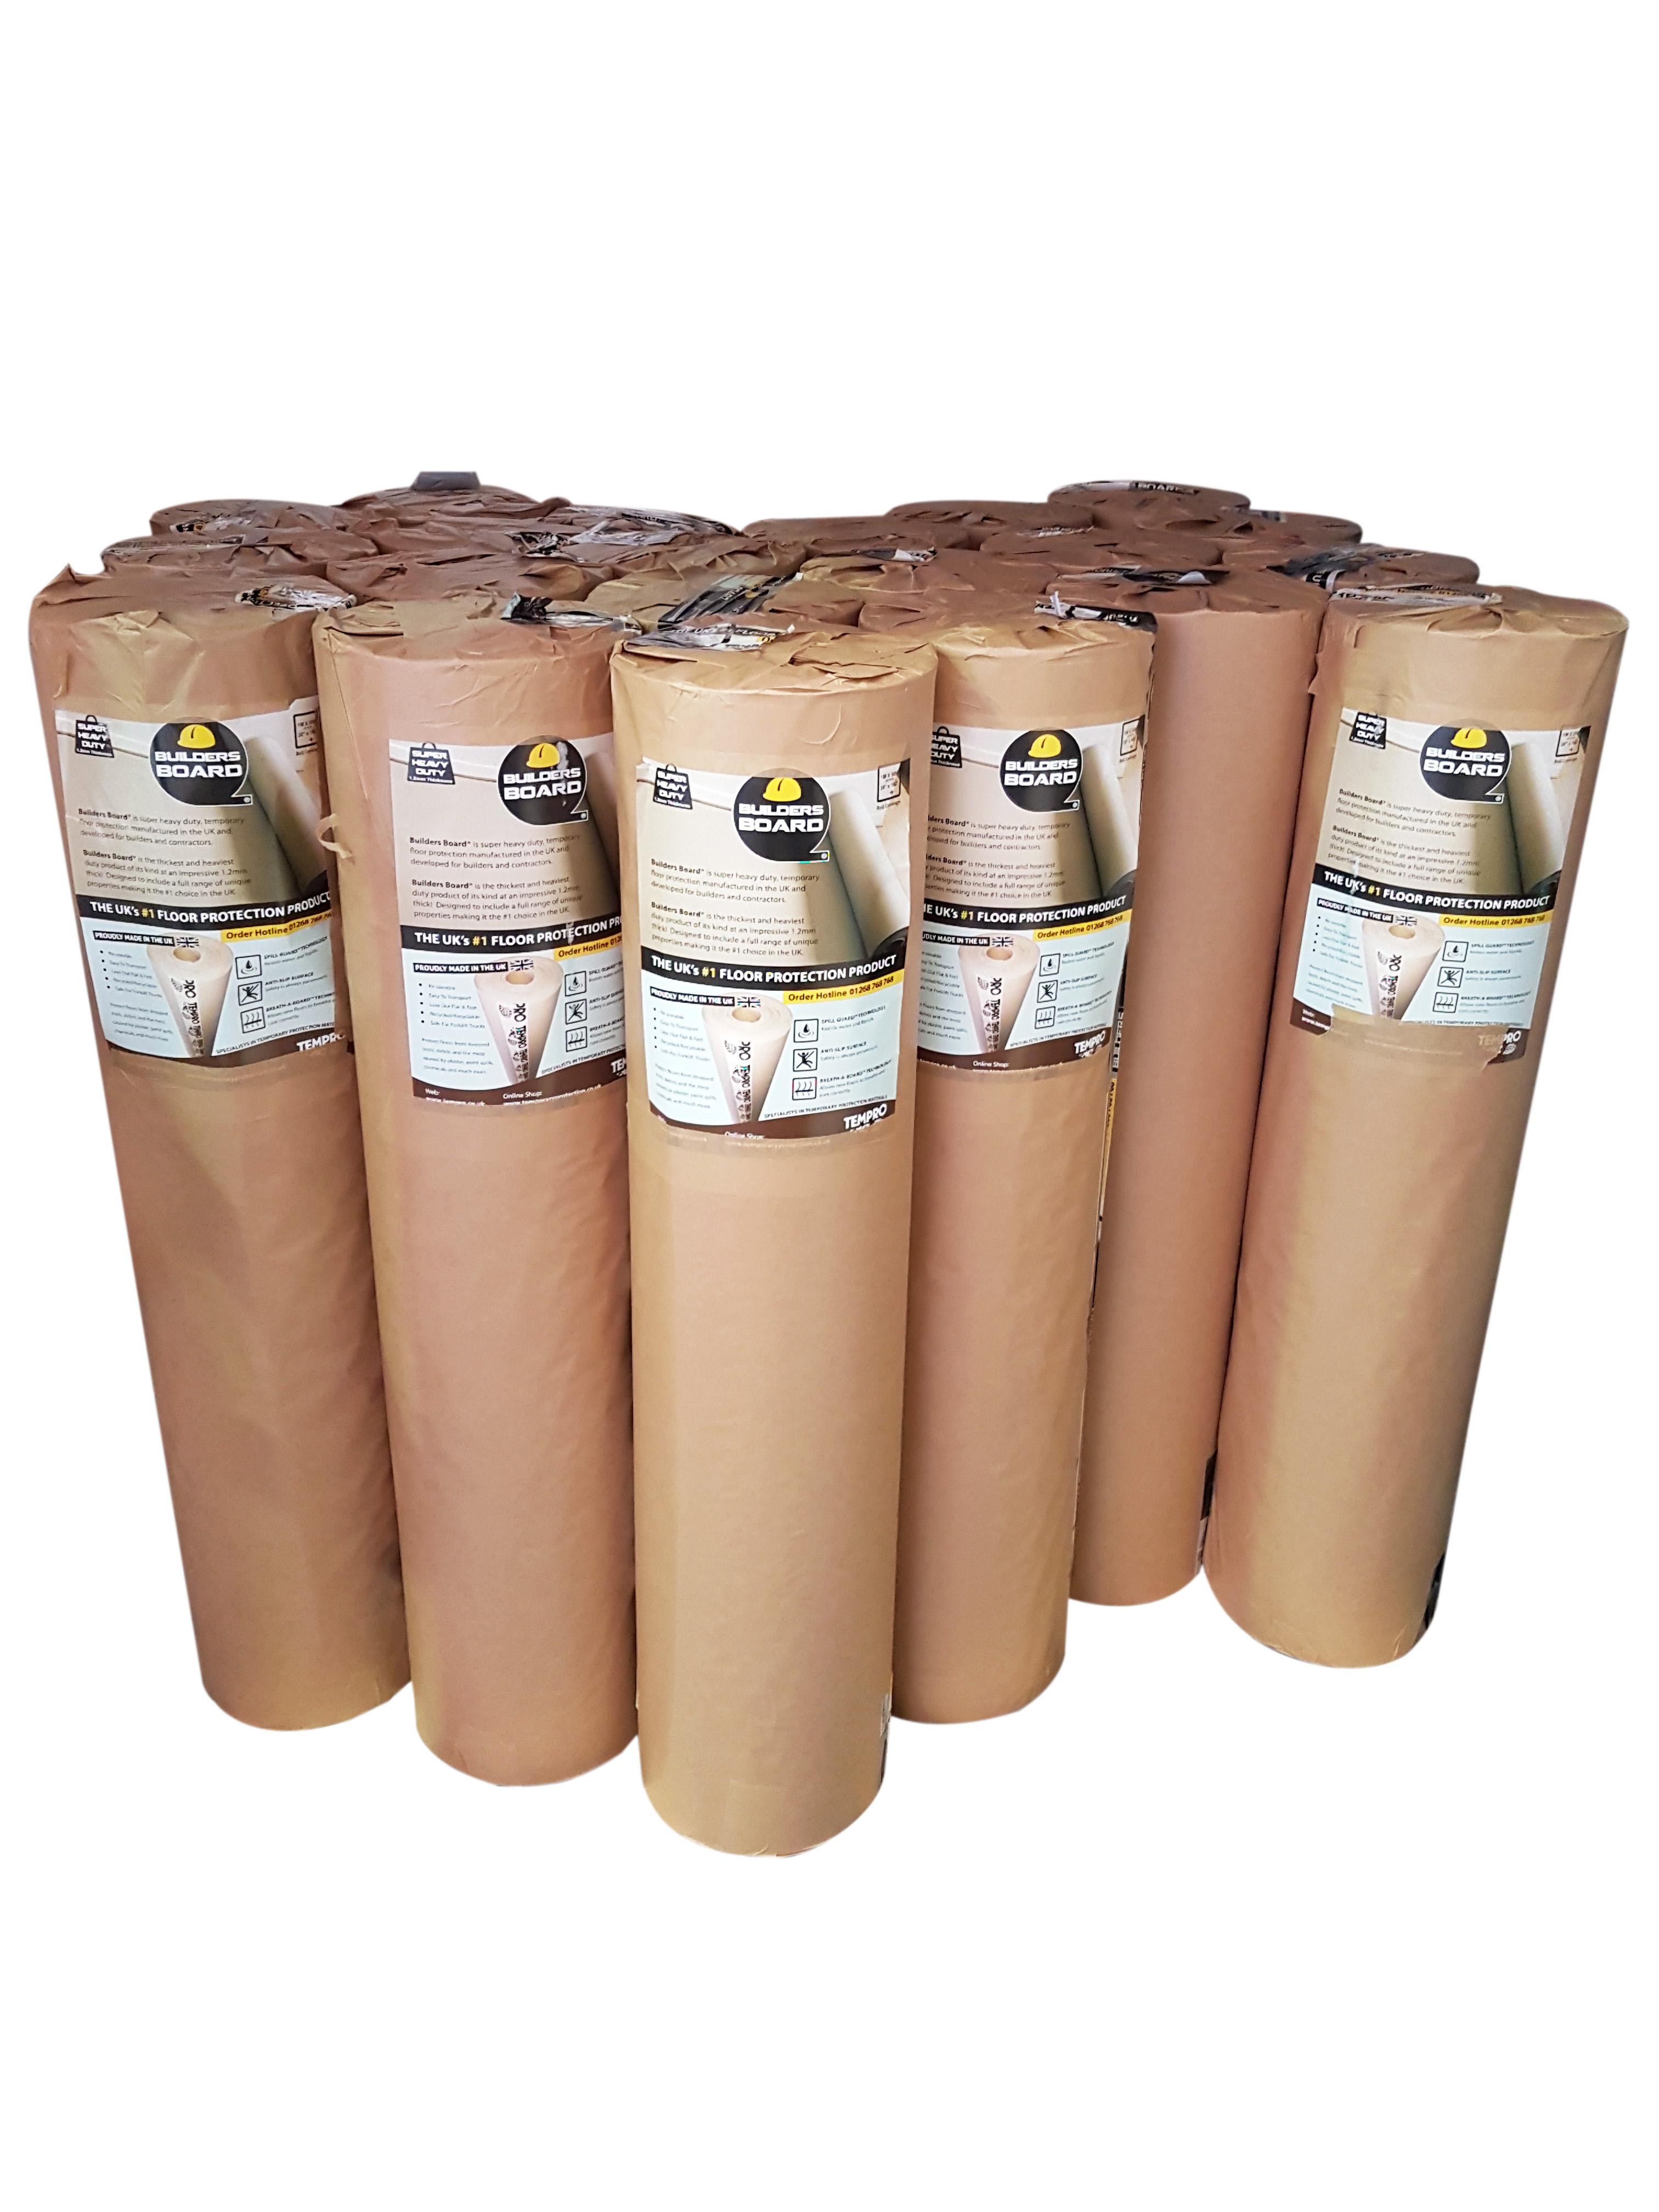 Builders Board Super Heavy Duty Floor Protector